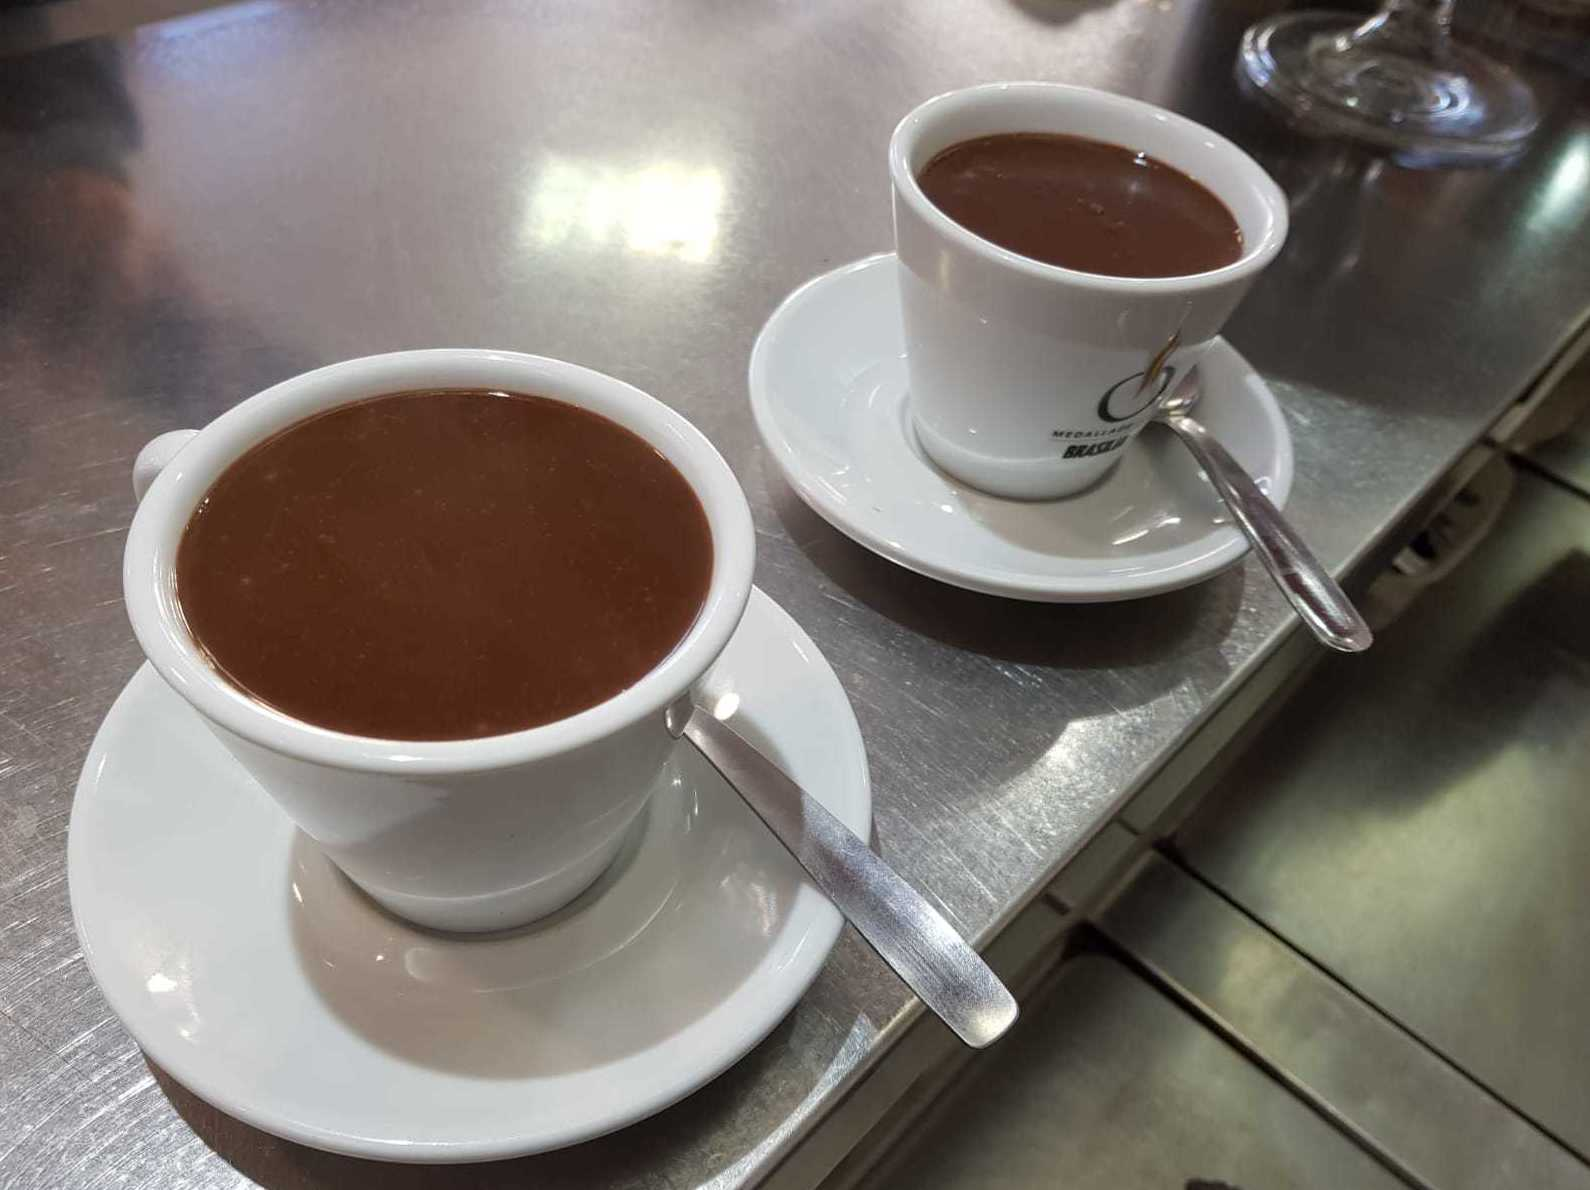 Foto 16 de Bares de tapas en Viladecans | Bar Churrería D'Tapas